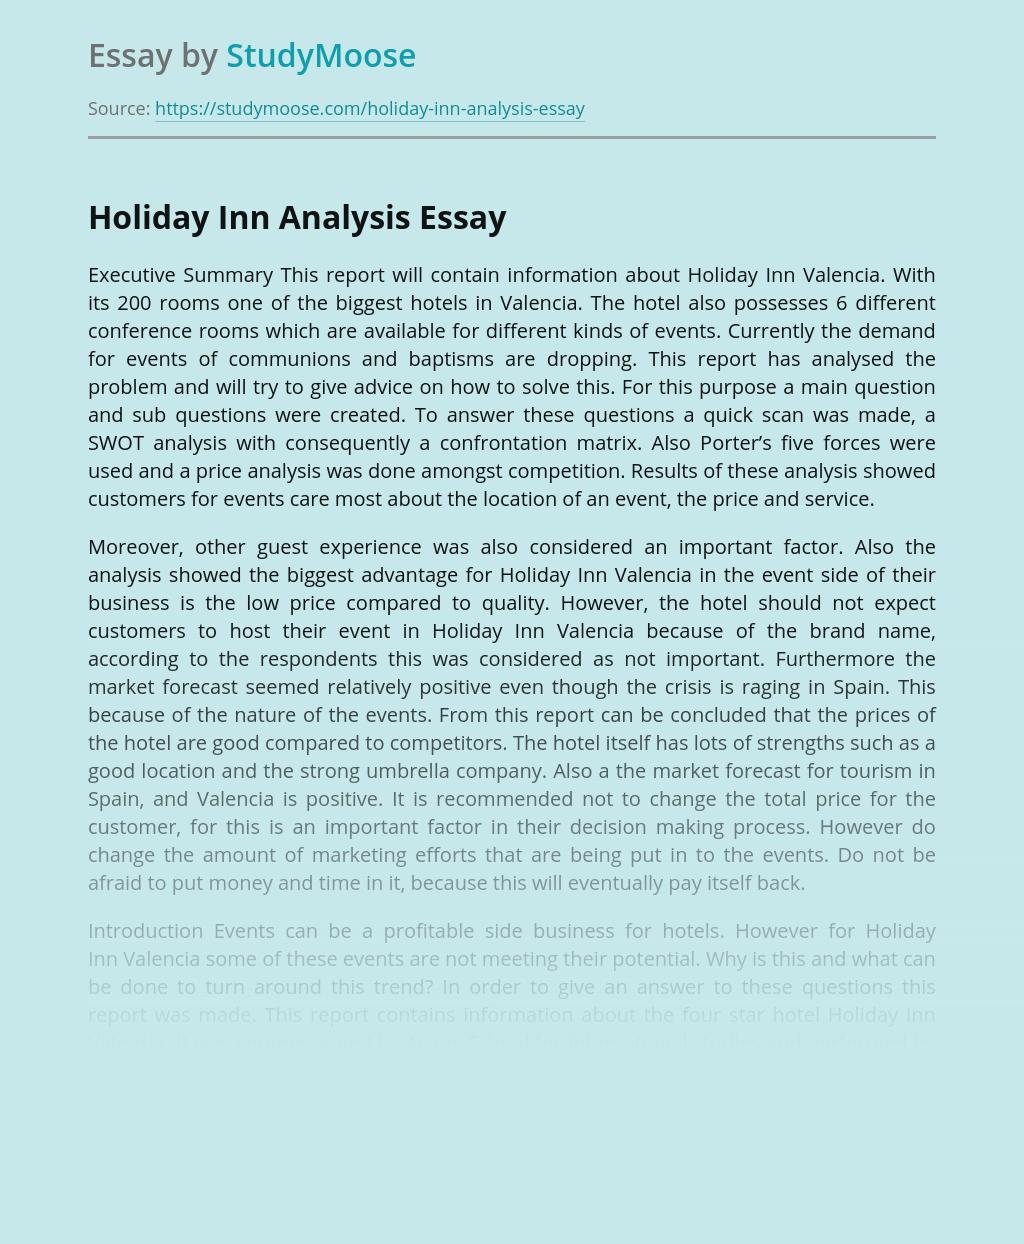 Holiday Inn Analysis